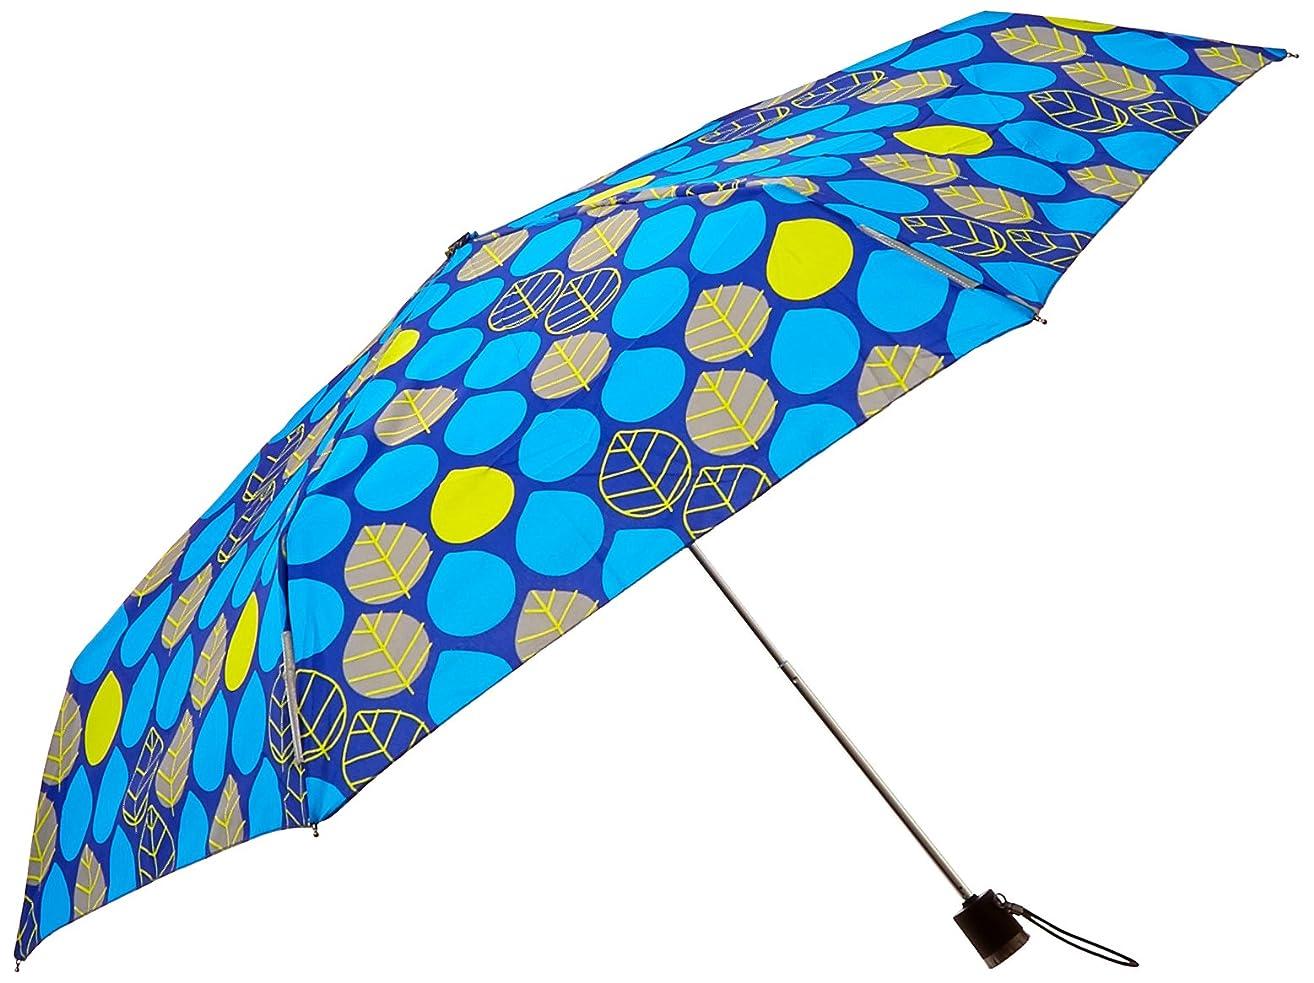 Totes Trx Manual Light-N-Go Trekker Umbrella, Leaves, One Size